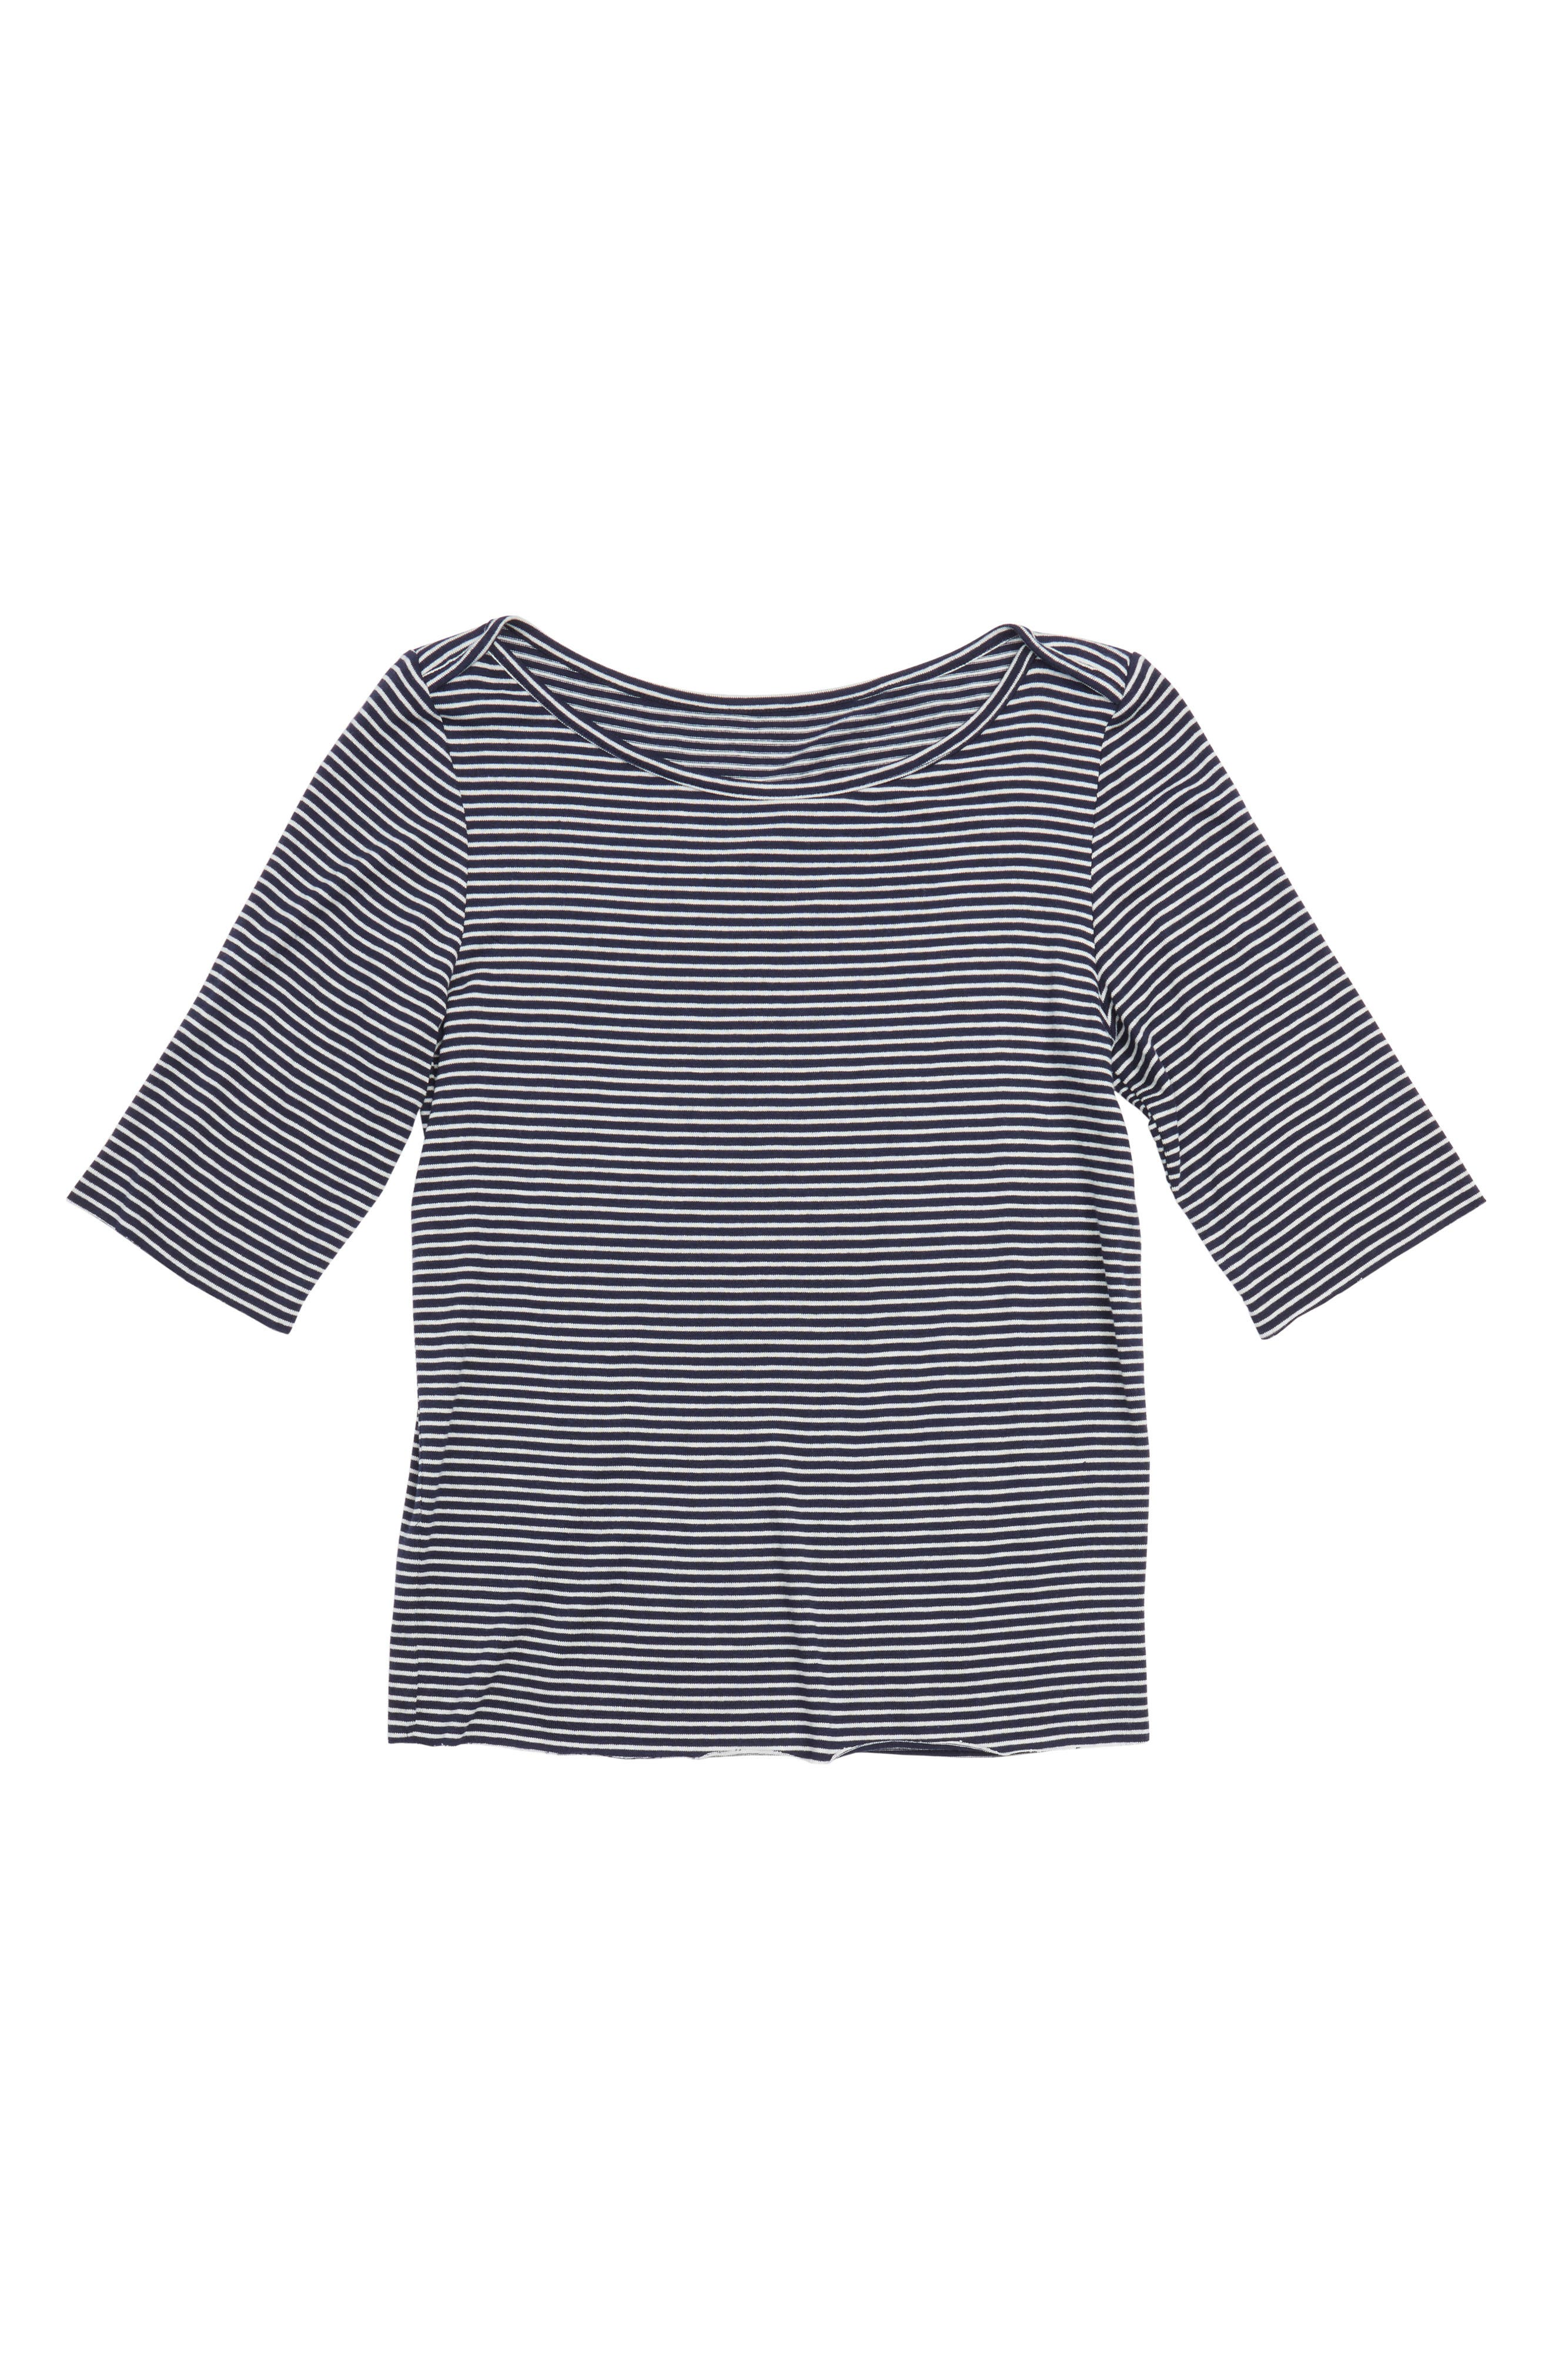 Stripe Tee,                         Main,                         color, 410